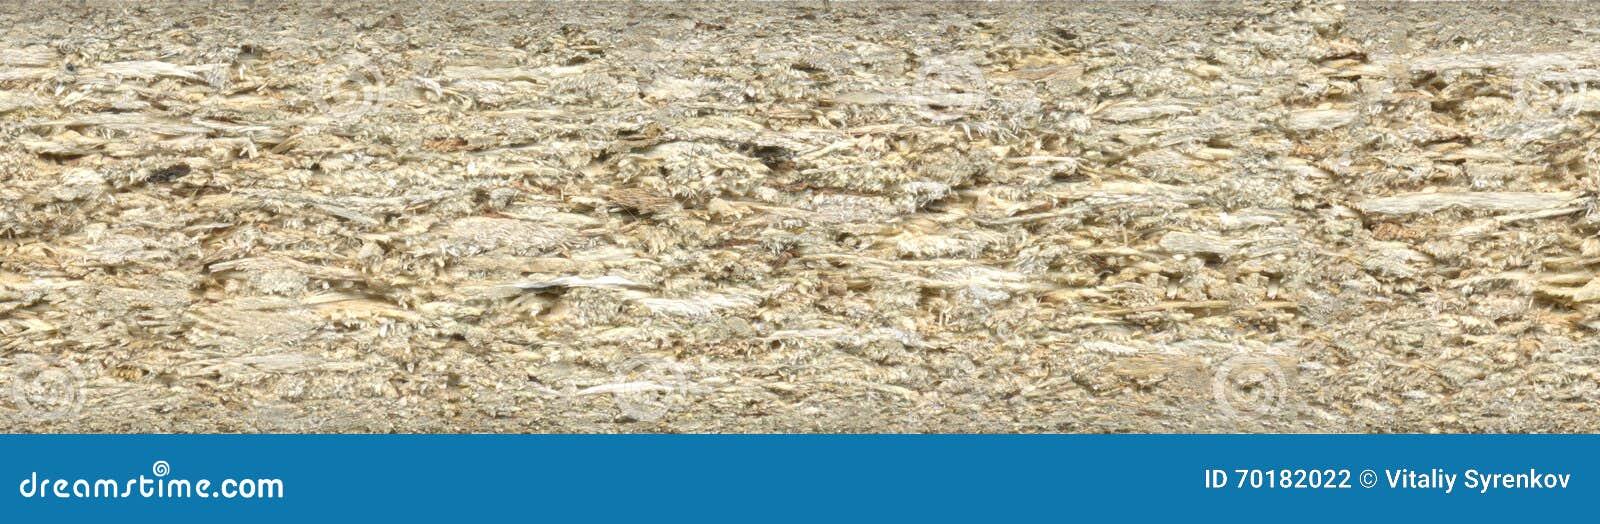 Sömlös textur horisontellt, träflismaterialslutframsida, möblemangpaneler, worktops